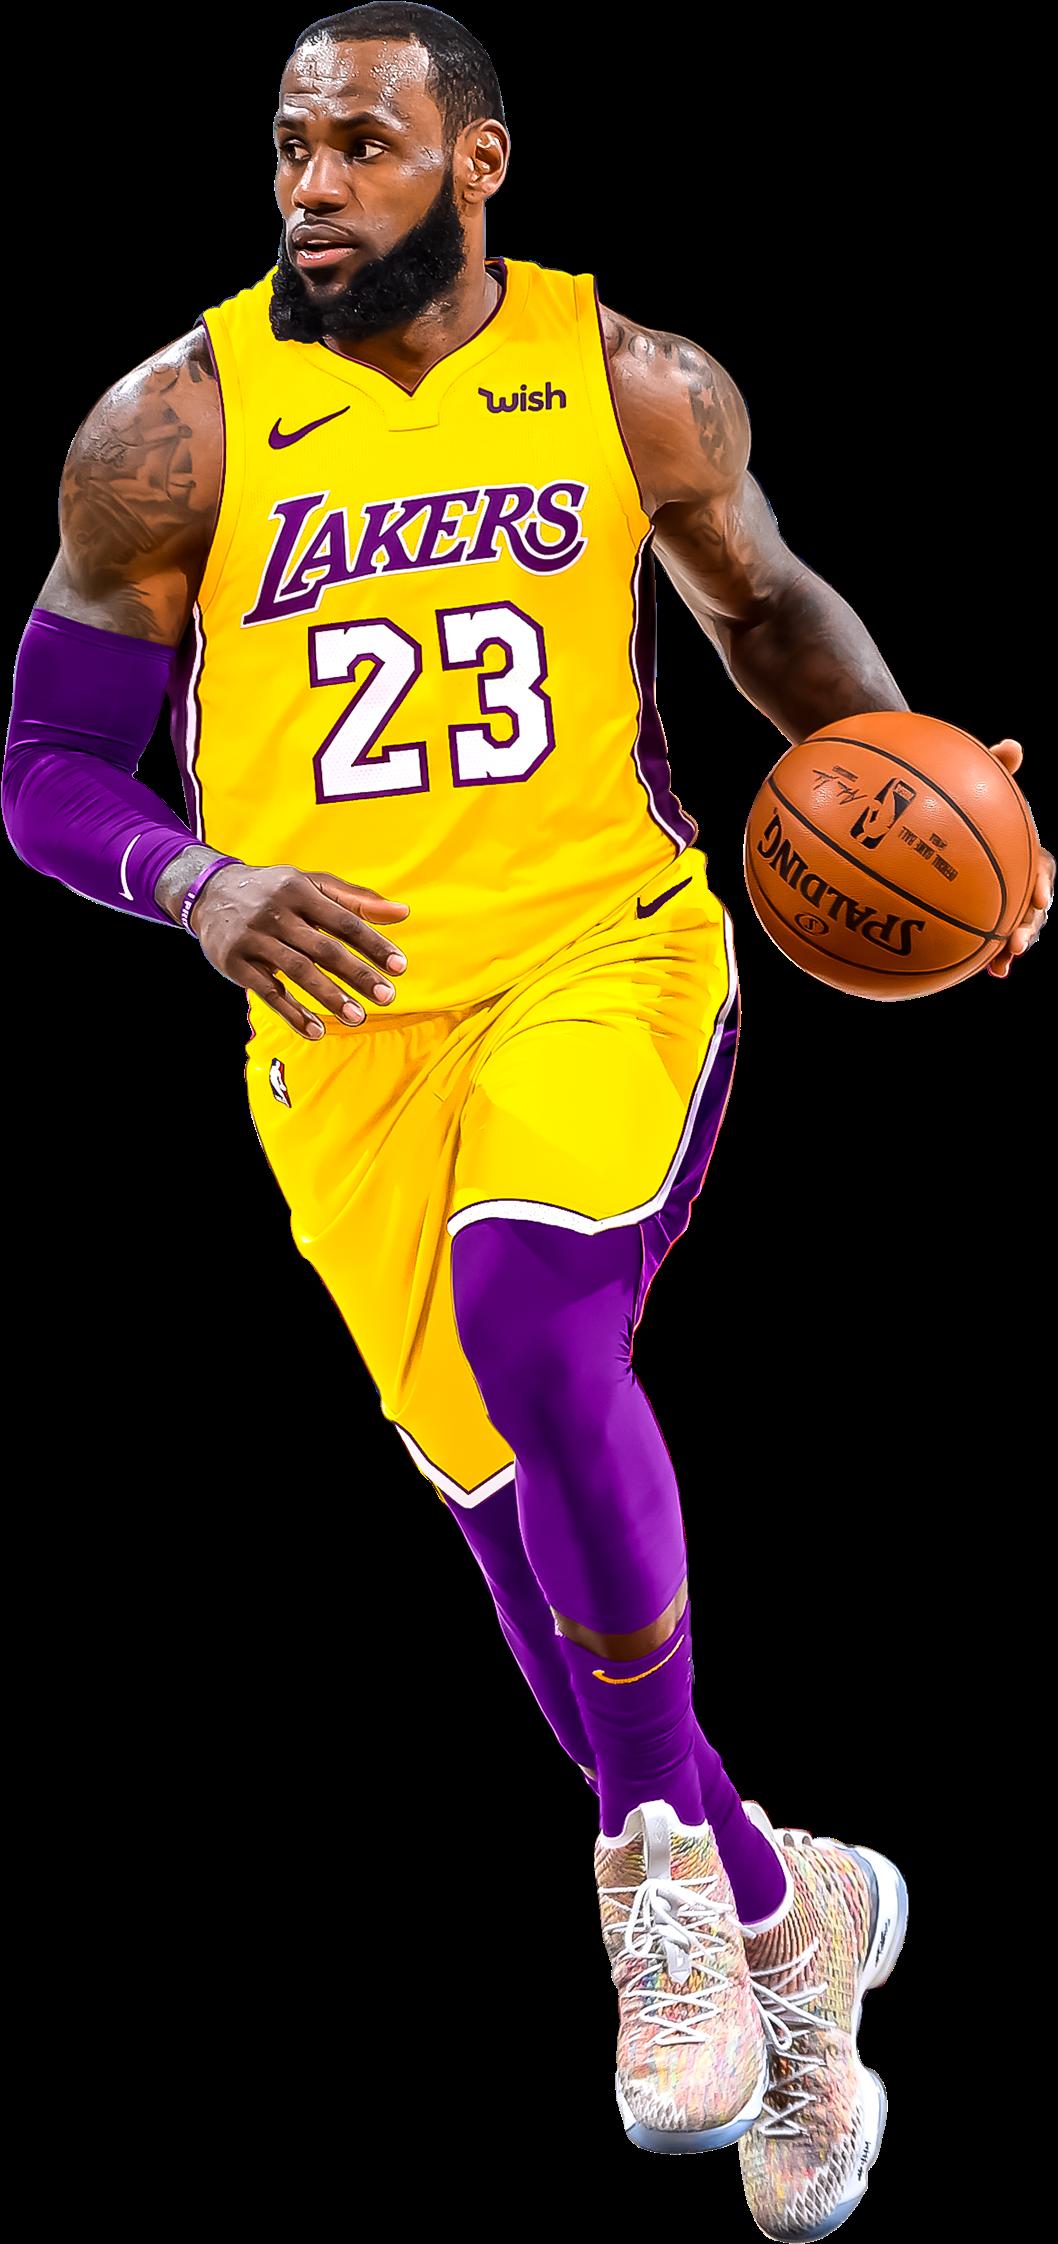 Download Hd Edited Photo Lebron James Lakers Transparent Transparent Png Image Nicepng Com